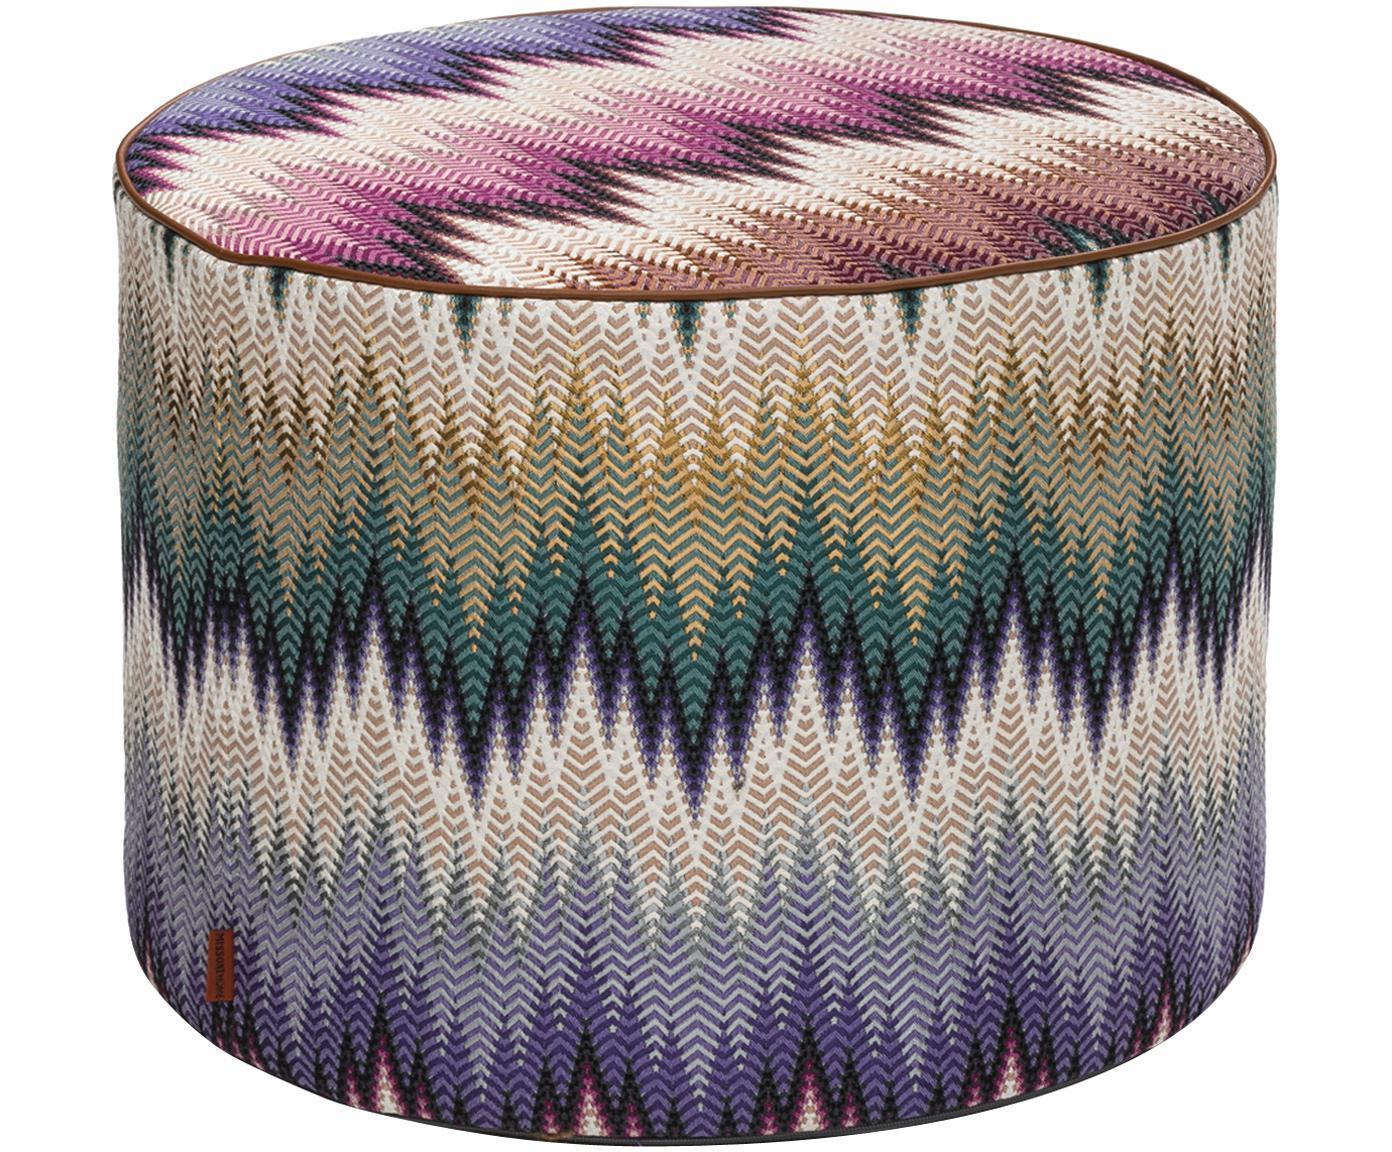 Design Pouf Phrae, Hülle: 57% Baumwolle, 26% Polyes, Mehrfarbig, Ø 40 x H 30 cm